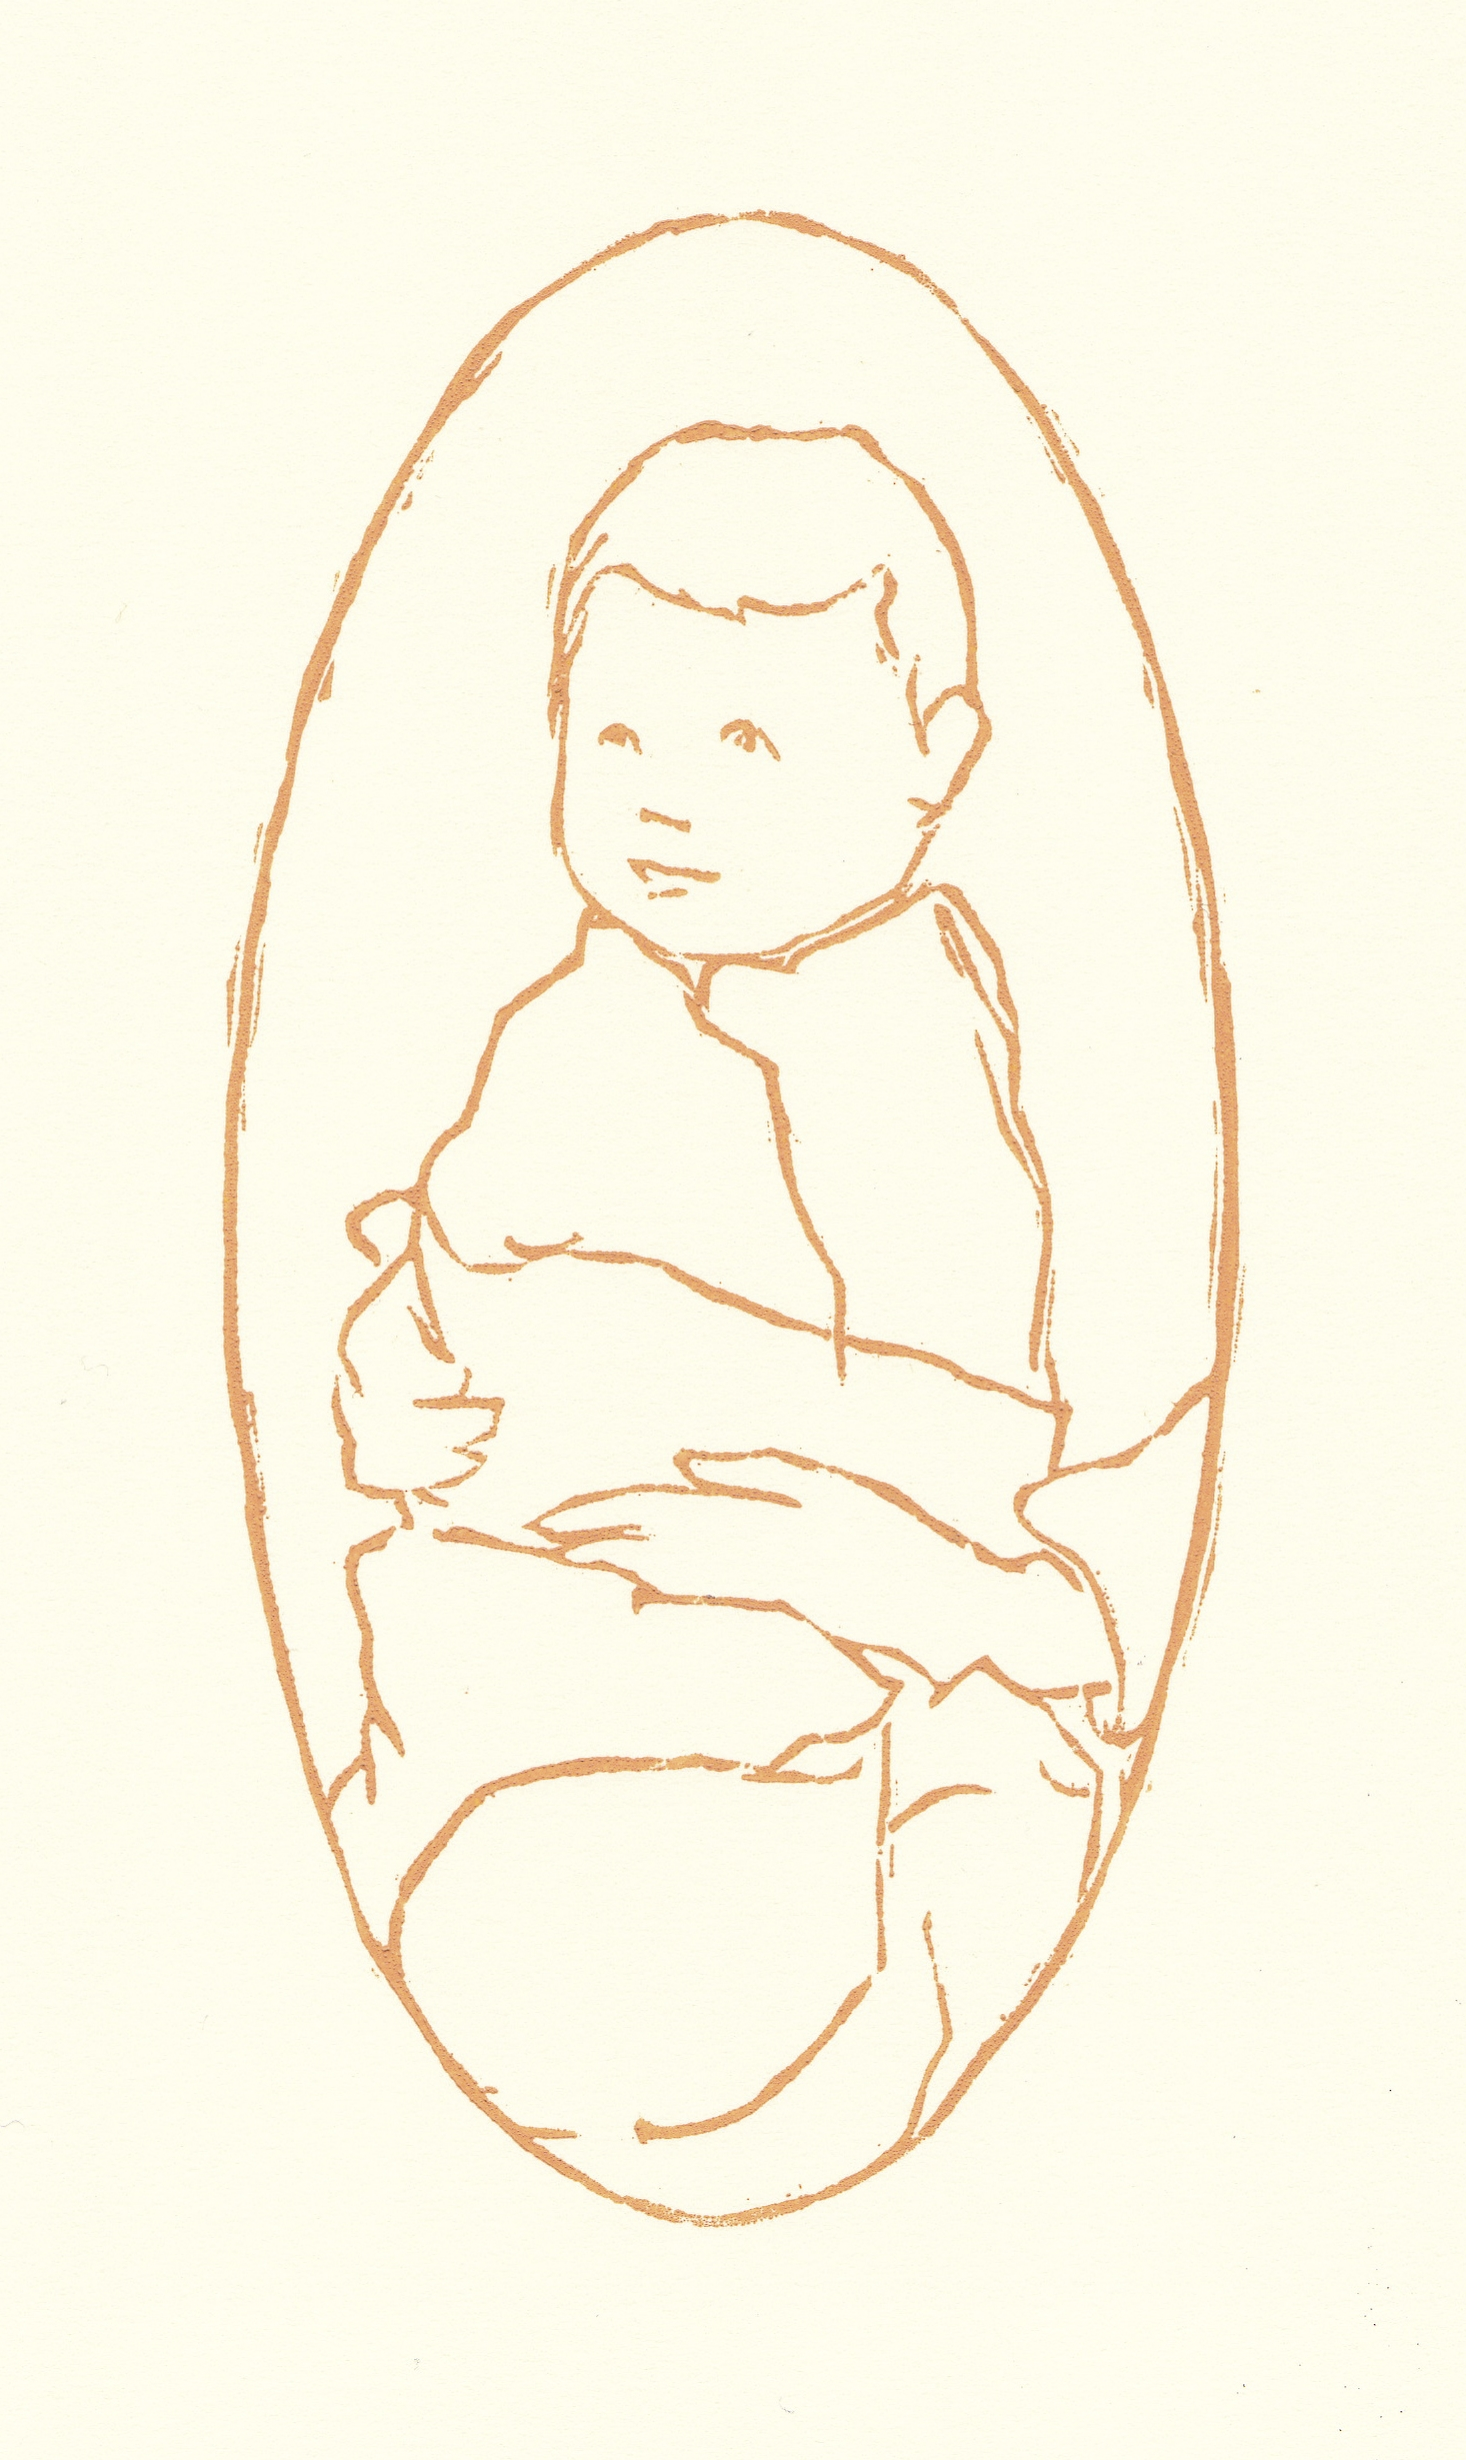 "baby   woodblock print  edition of 35  3.5x6.75""  2014"